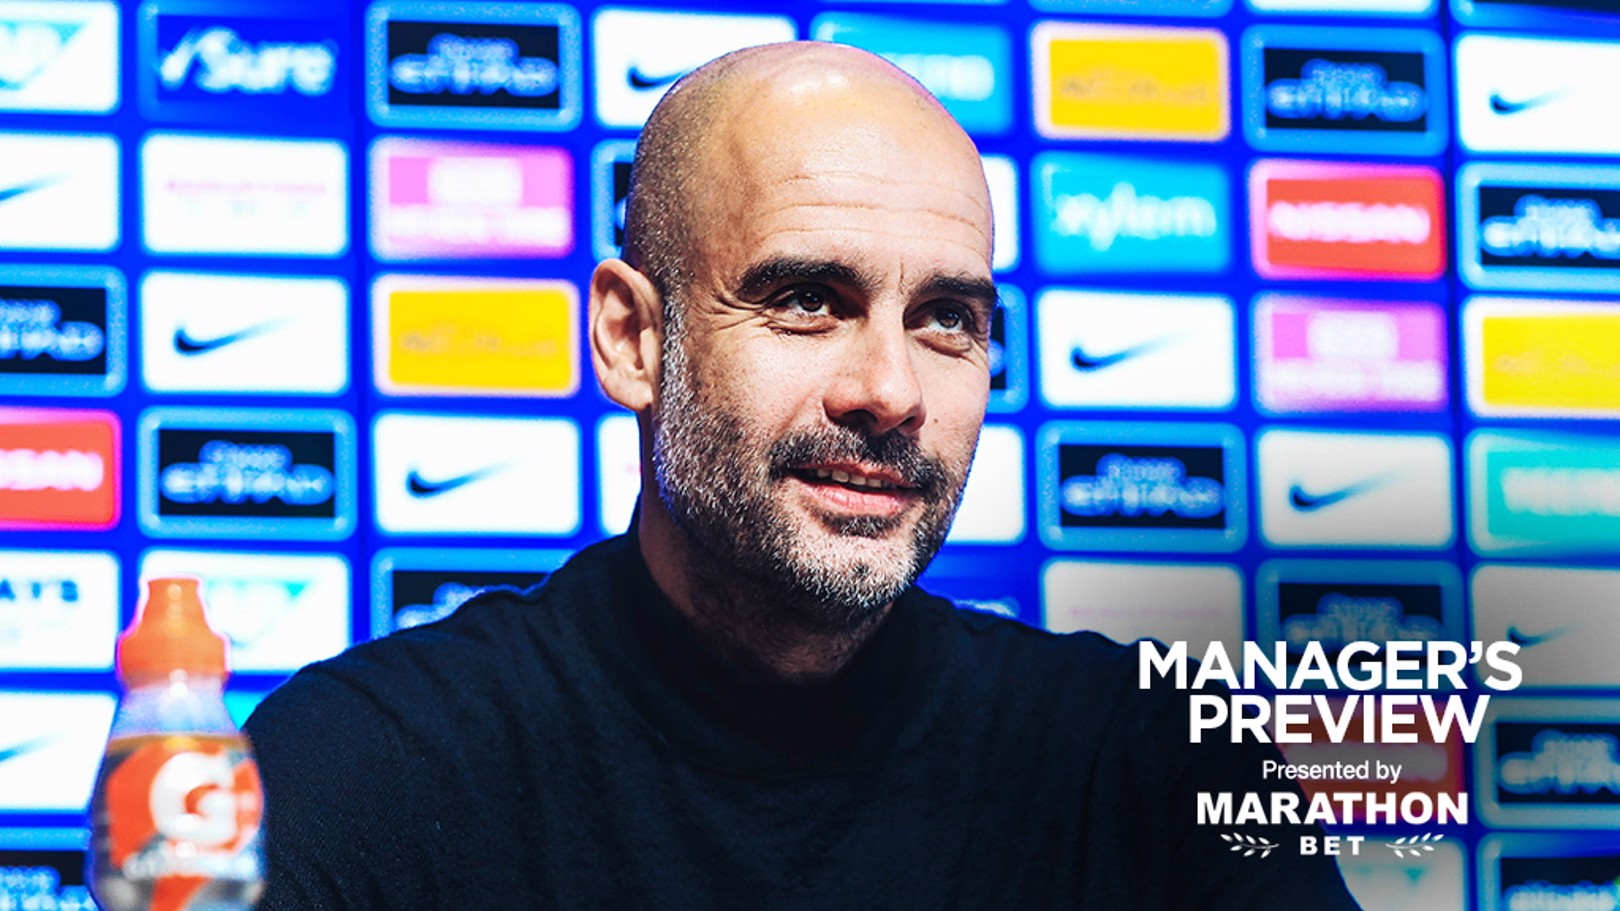 PRE-MATCH: Pep Guardiola speaks to the media ahead of Burnley.